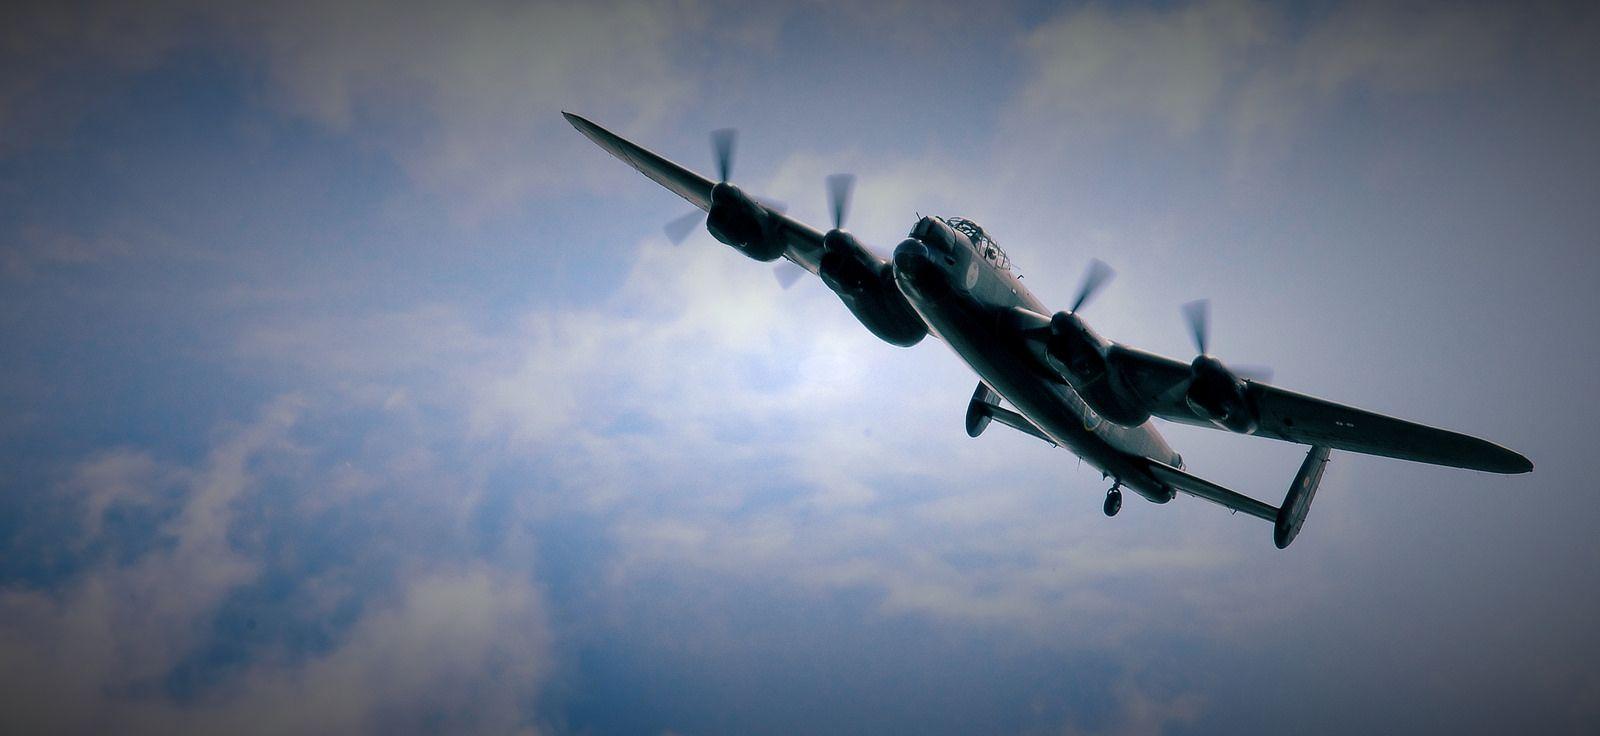 Avro Lancaster - by Ian Kindred | Flickr